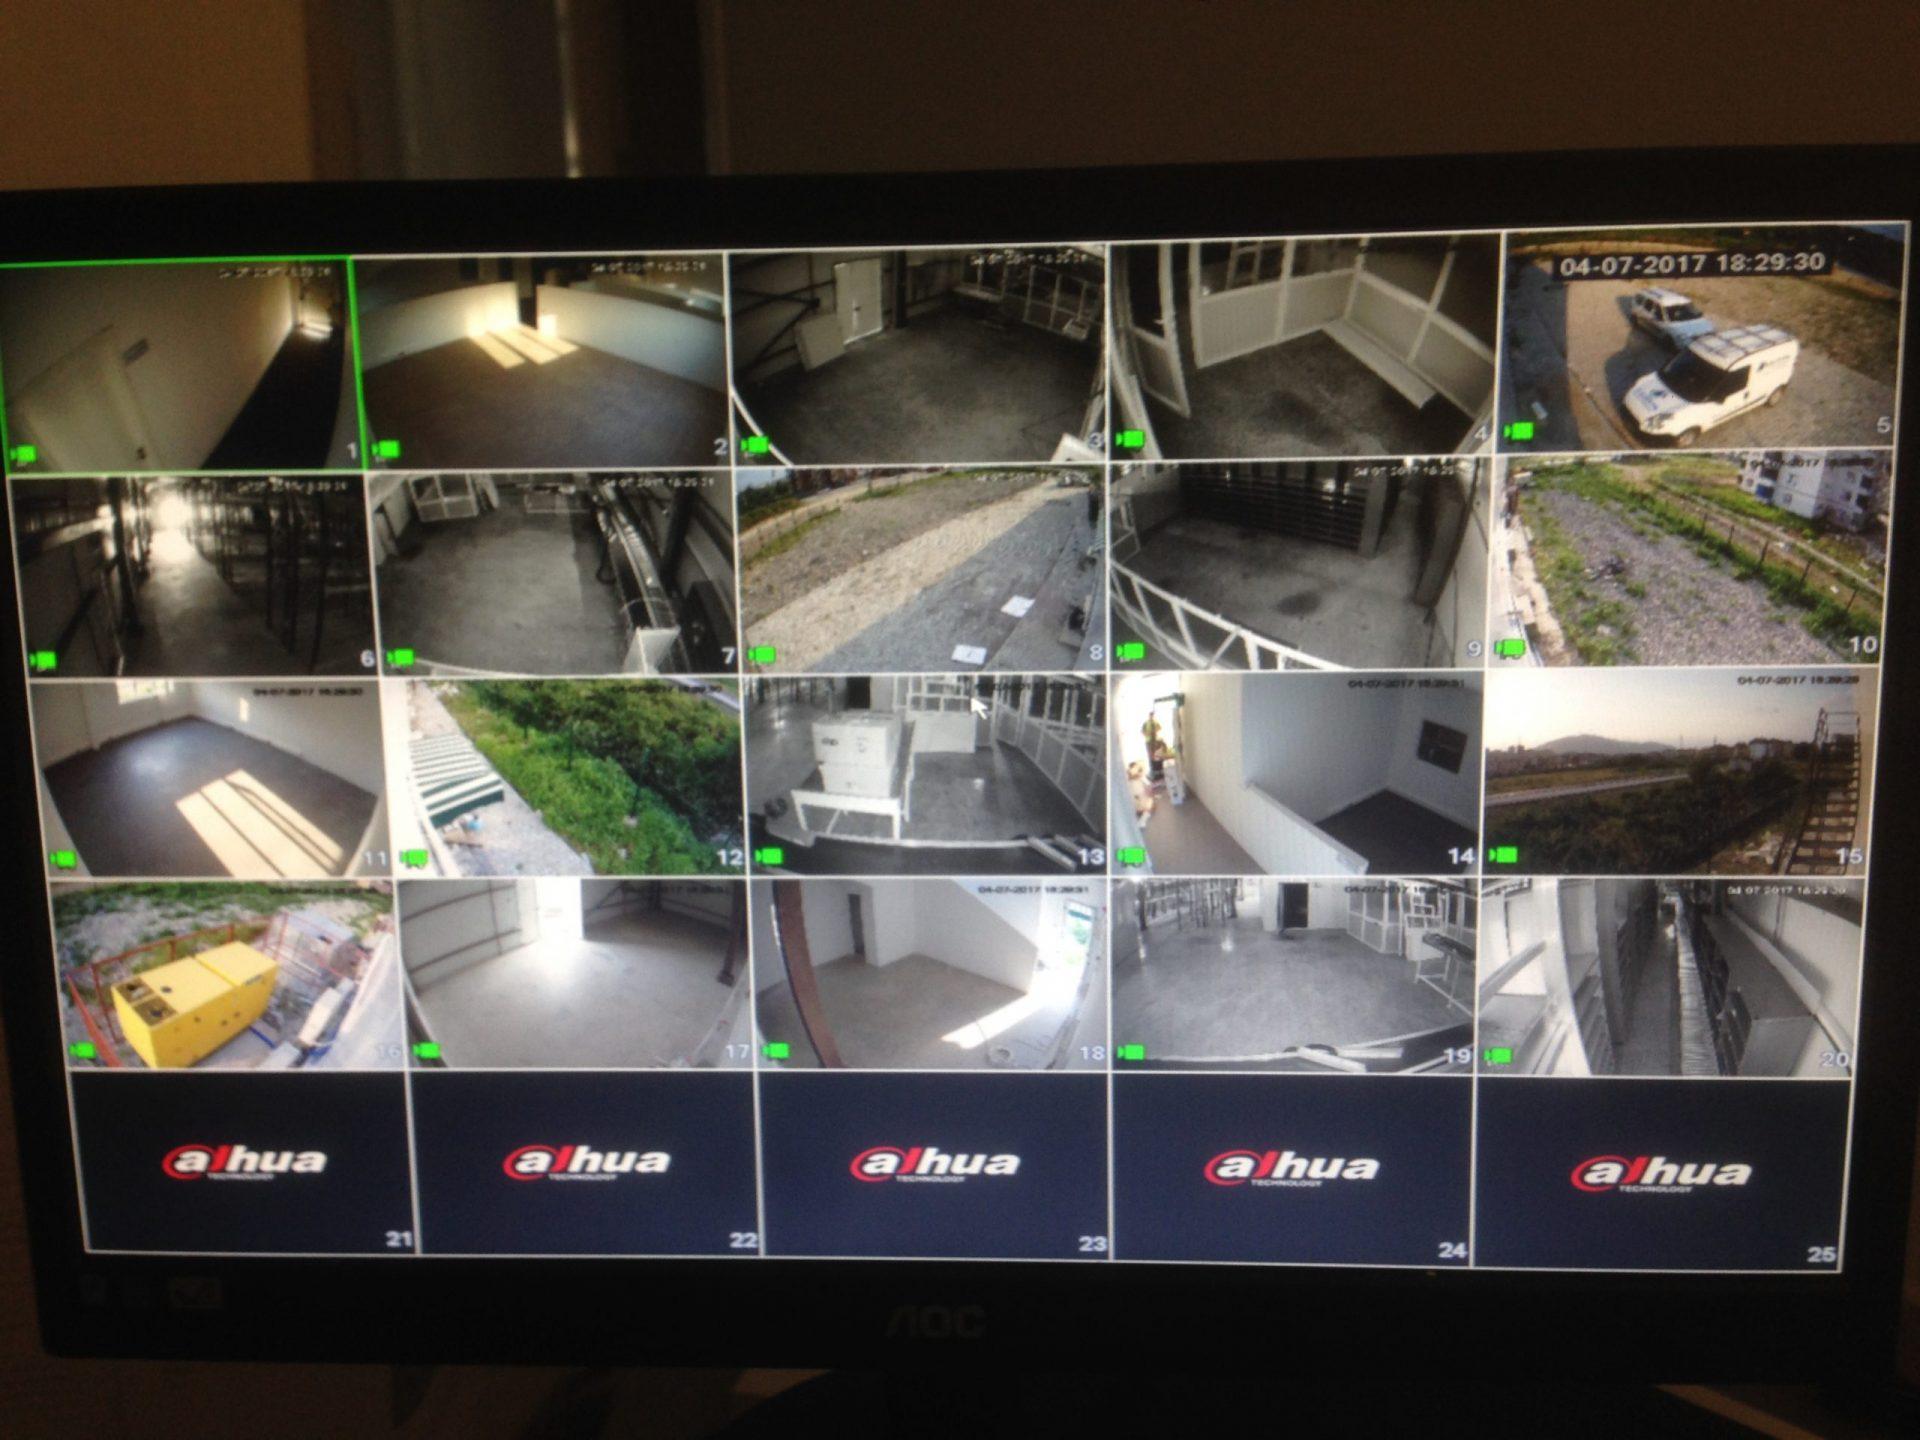 buyukada-guvenlik-kamera-sistemi-teknik-servis